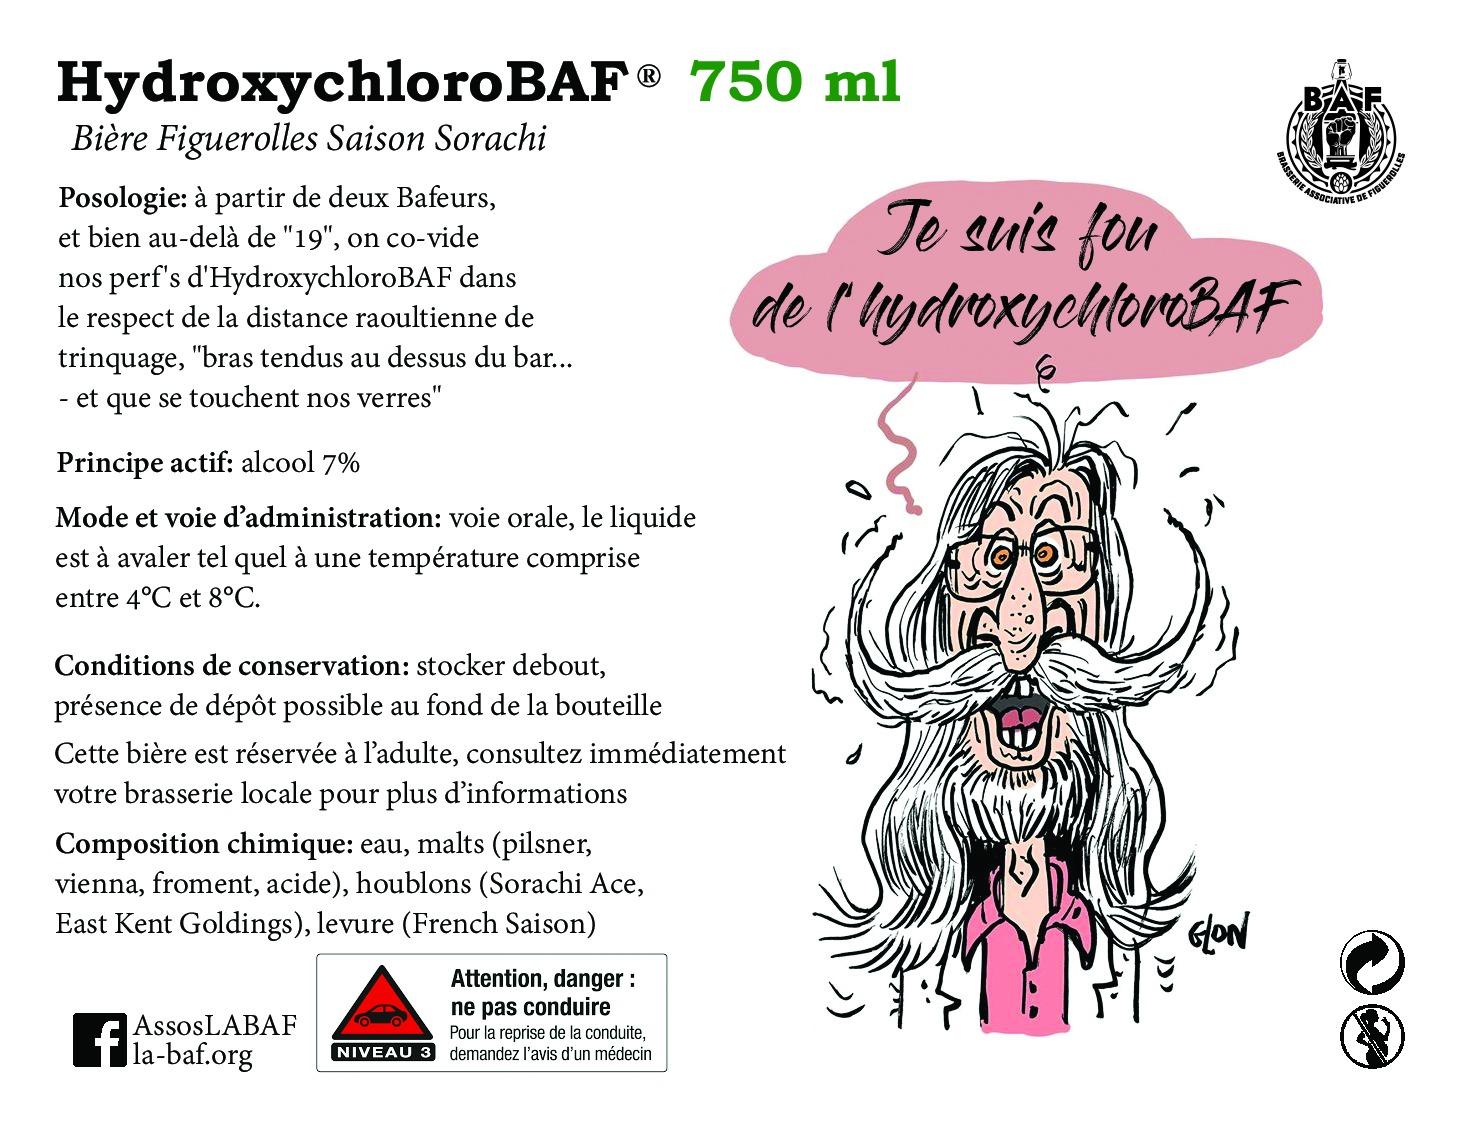 hydroxychloroBAF